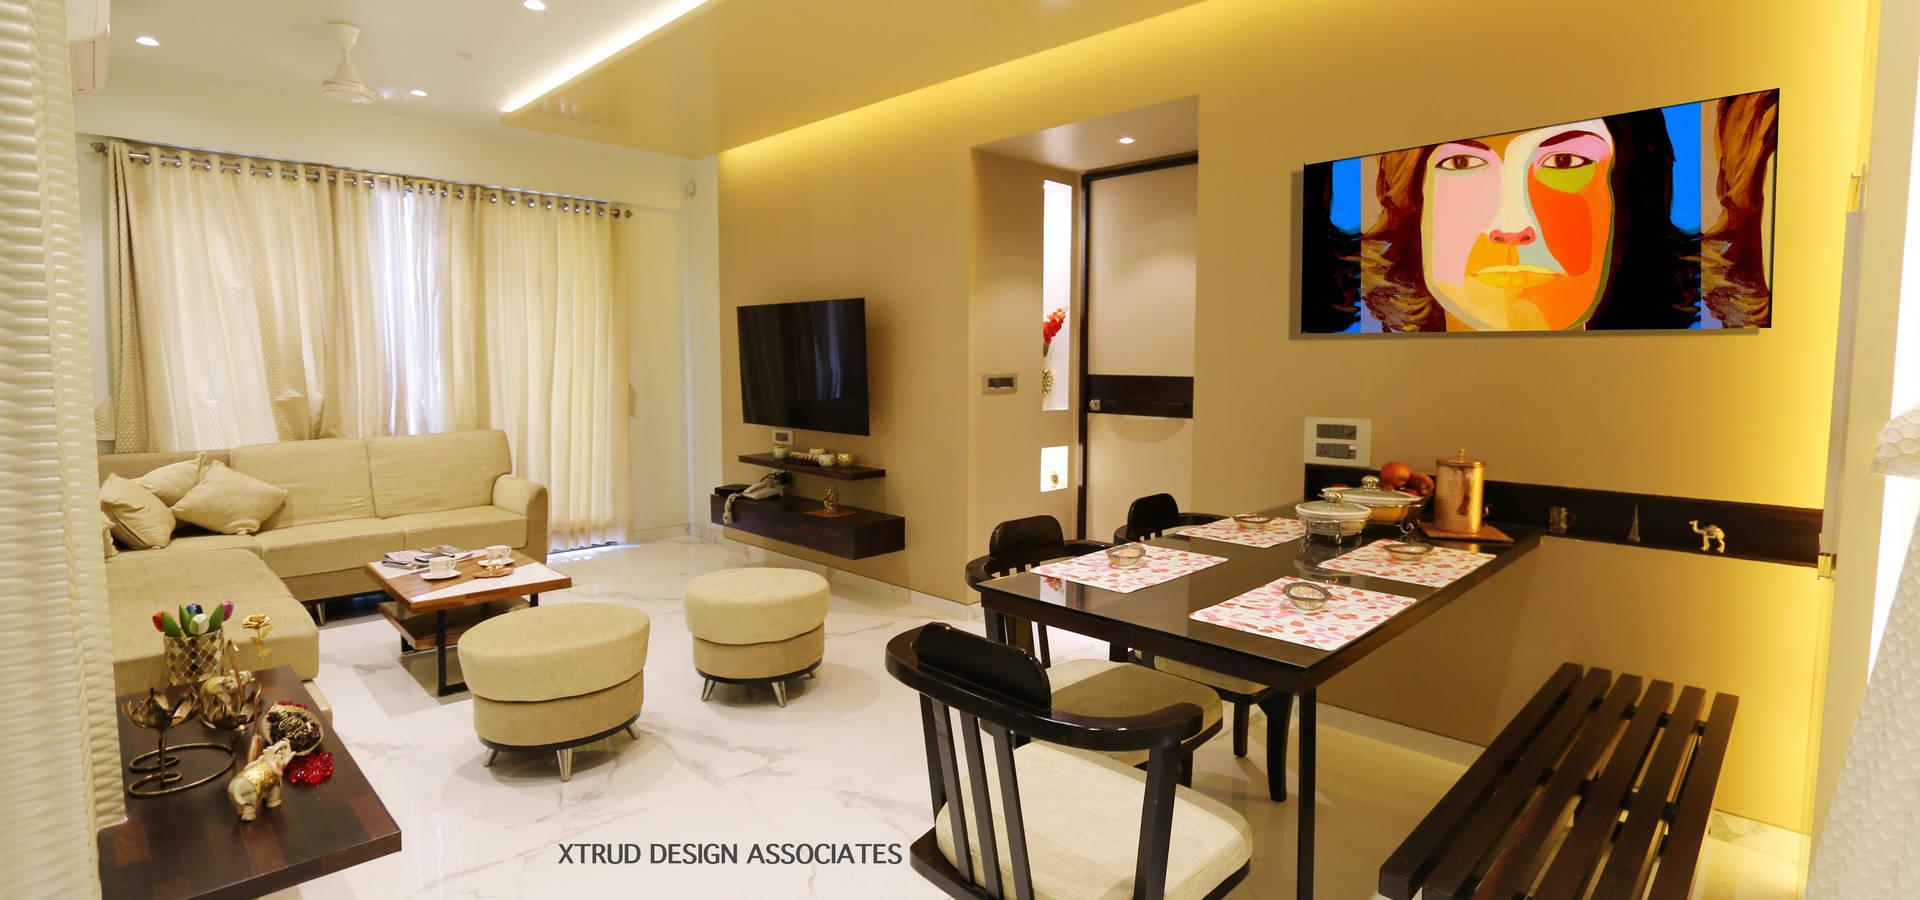 Xtrud designs associates